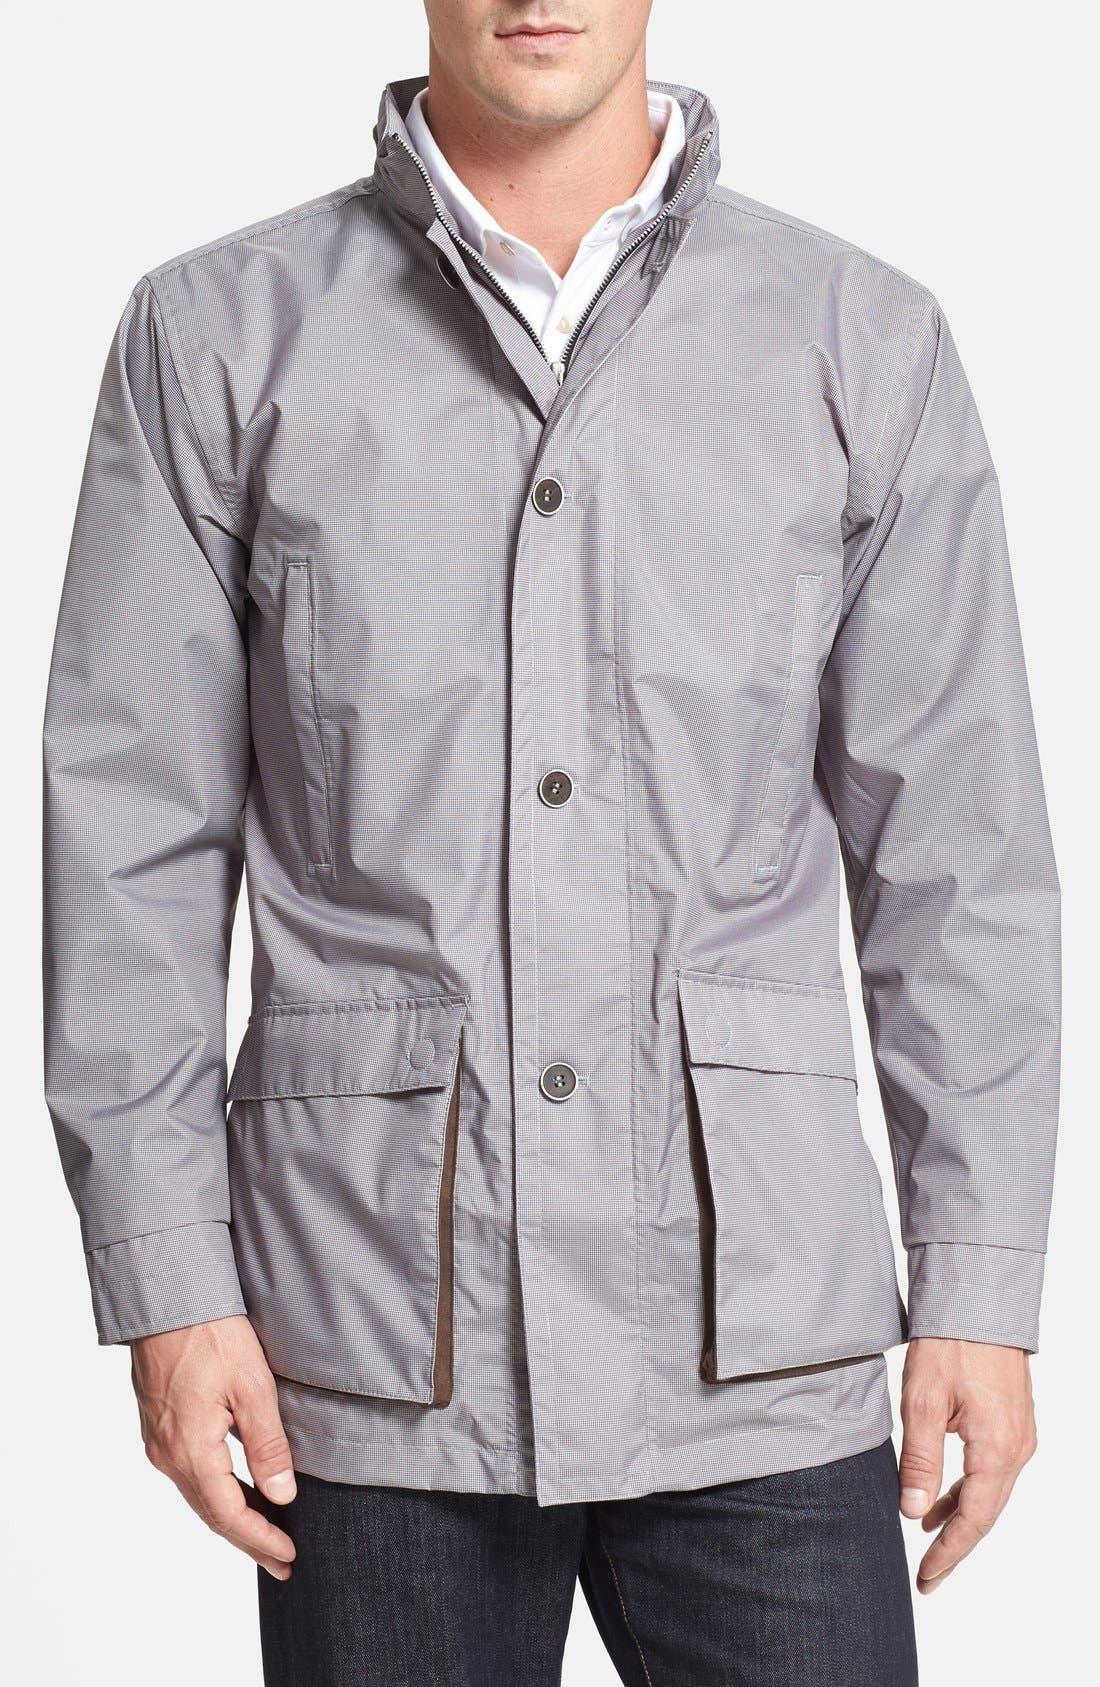 Alternate Image 1 Selected - Peter Millar 'Newport' Waterproof Full Zip Jacket